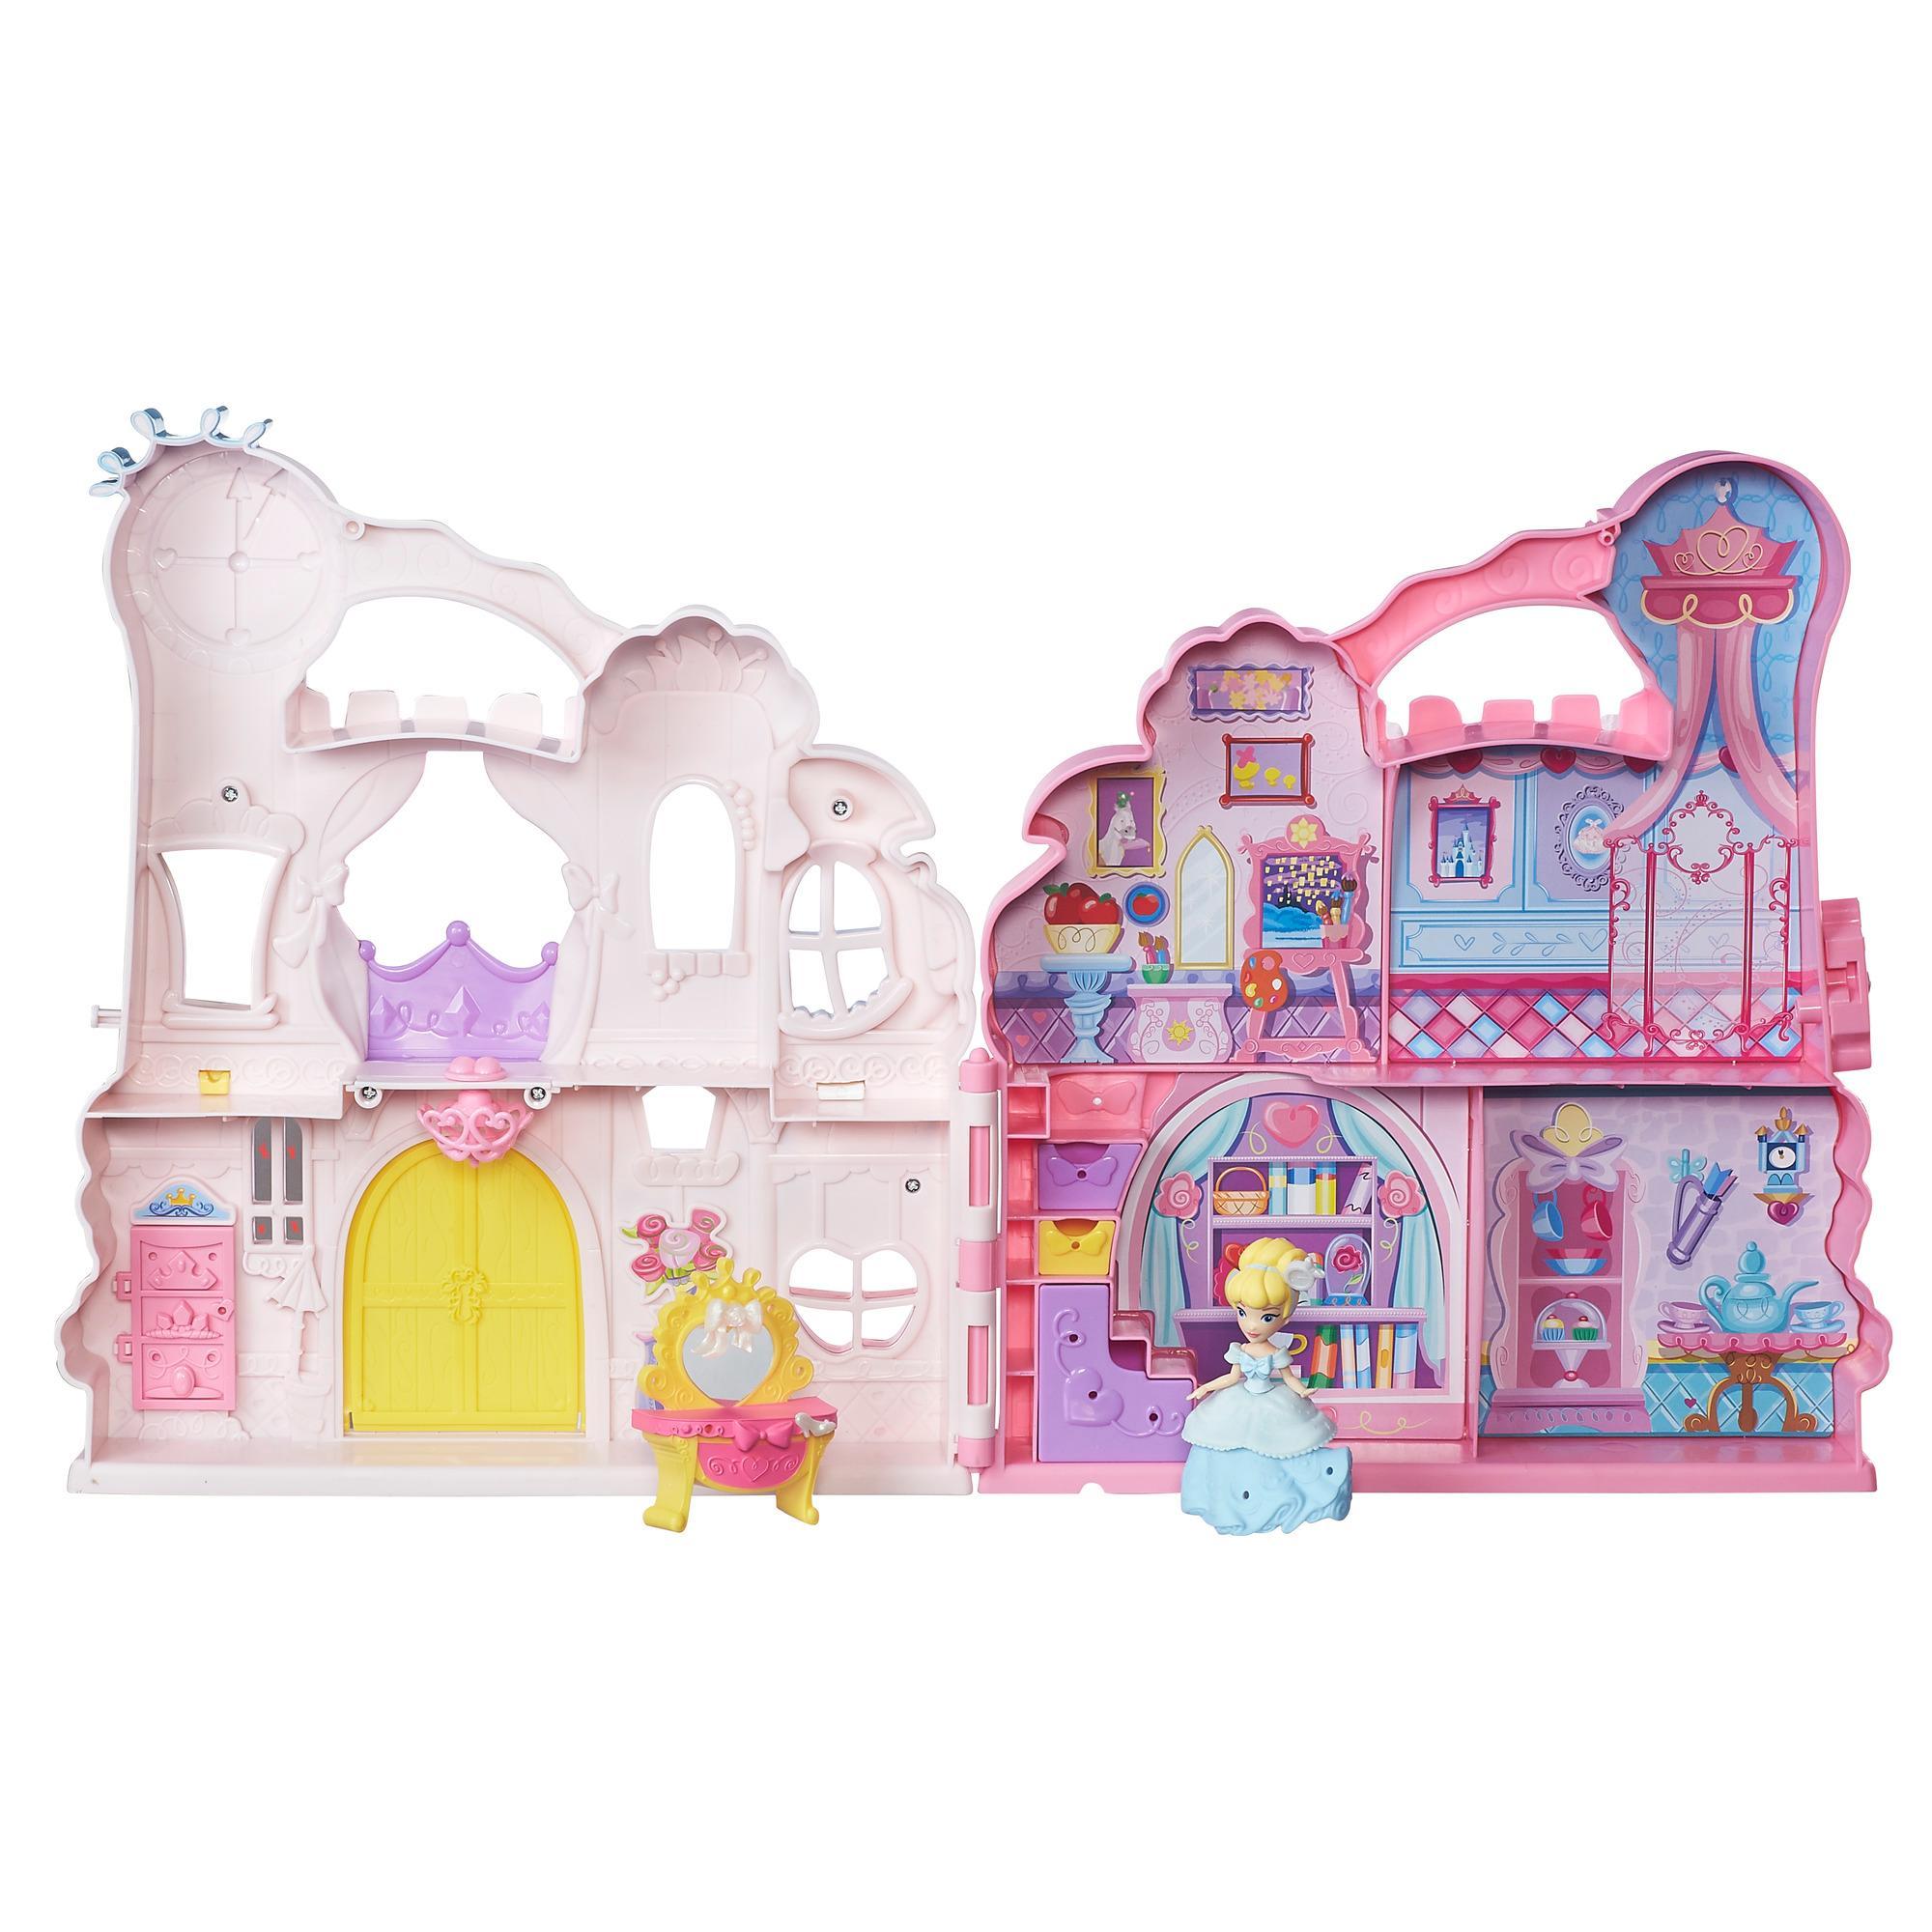 Disney princess little kingdom play 39 n carry - Image princesse disney ...